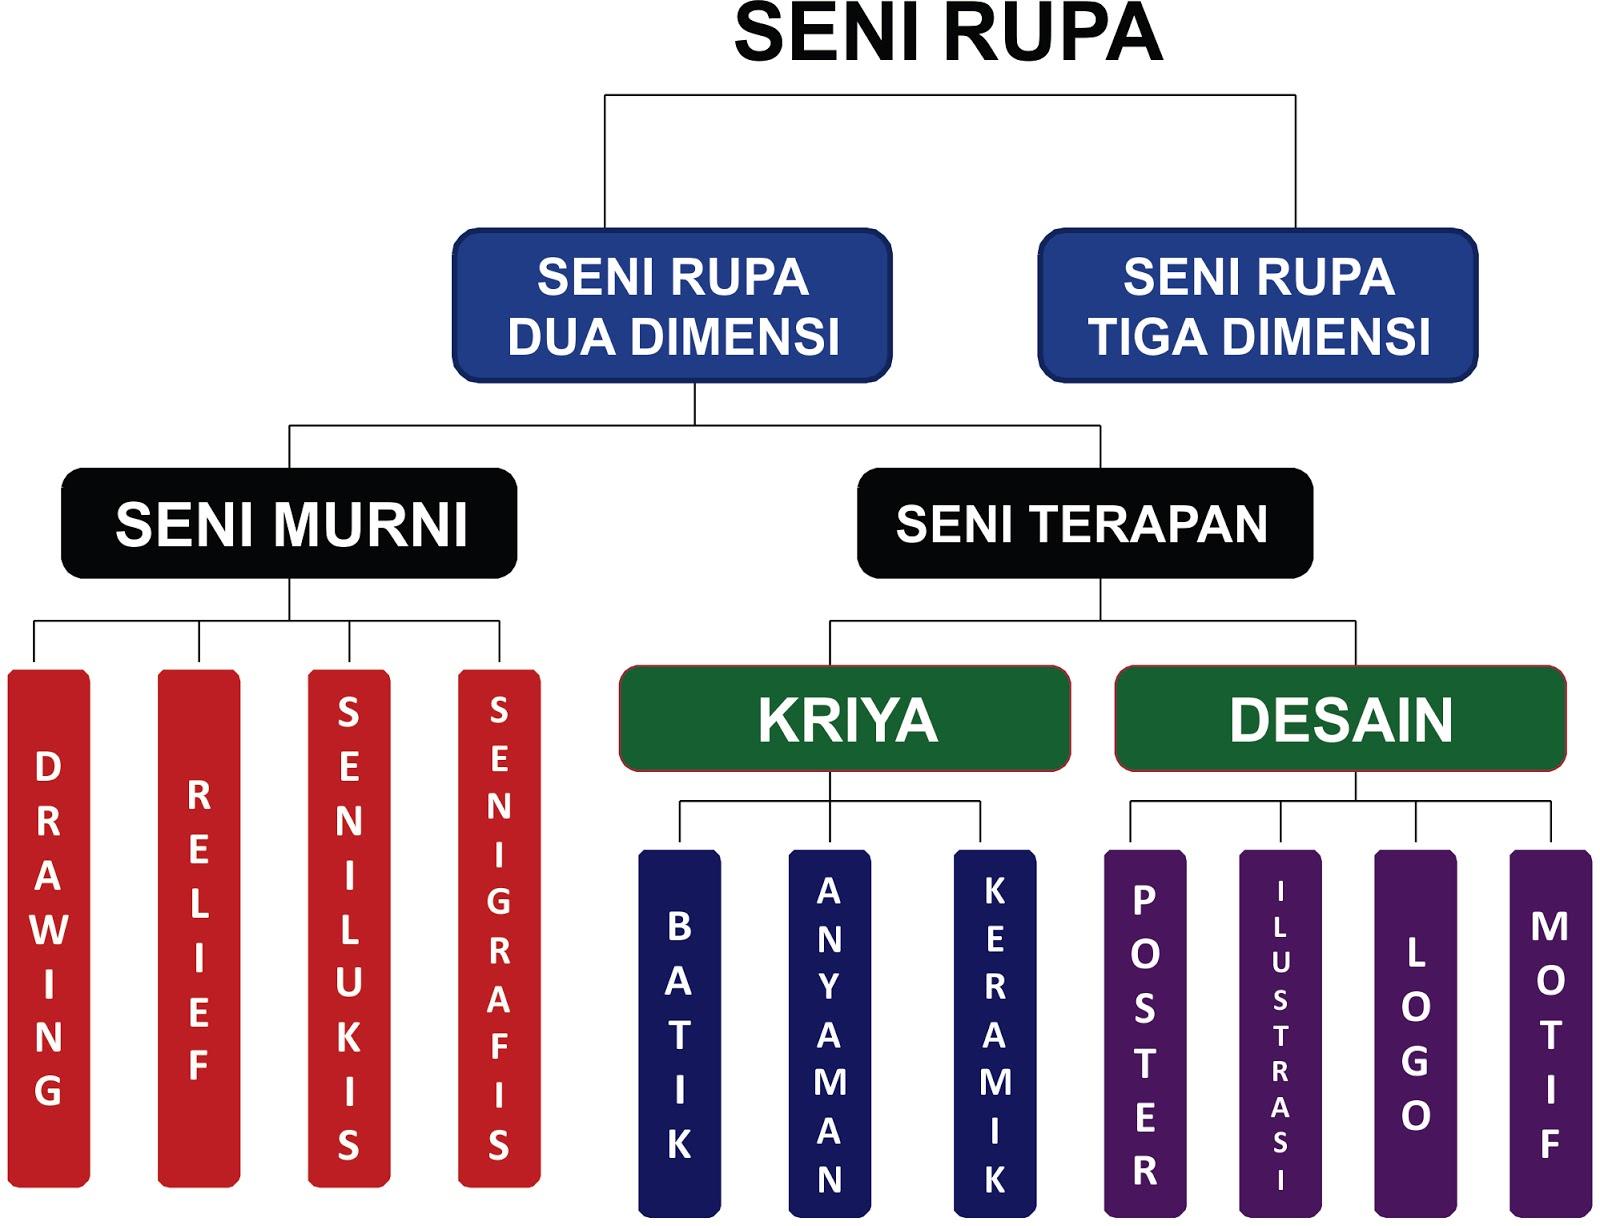 SENI BUDAYA (SENI RUPA)